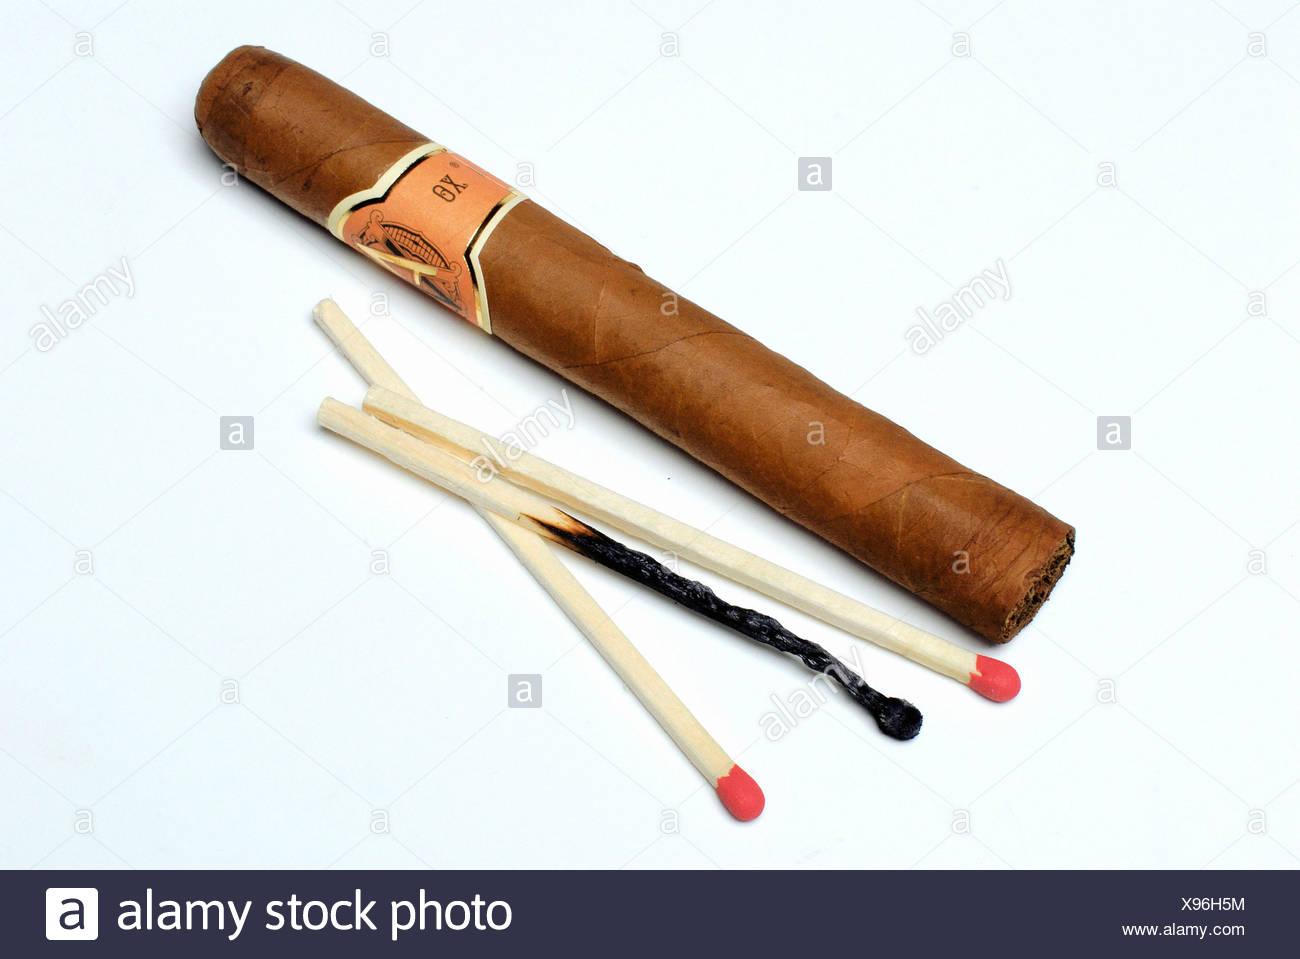 Matchsticks and Cigar - Stock Image